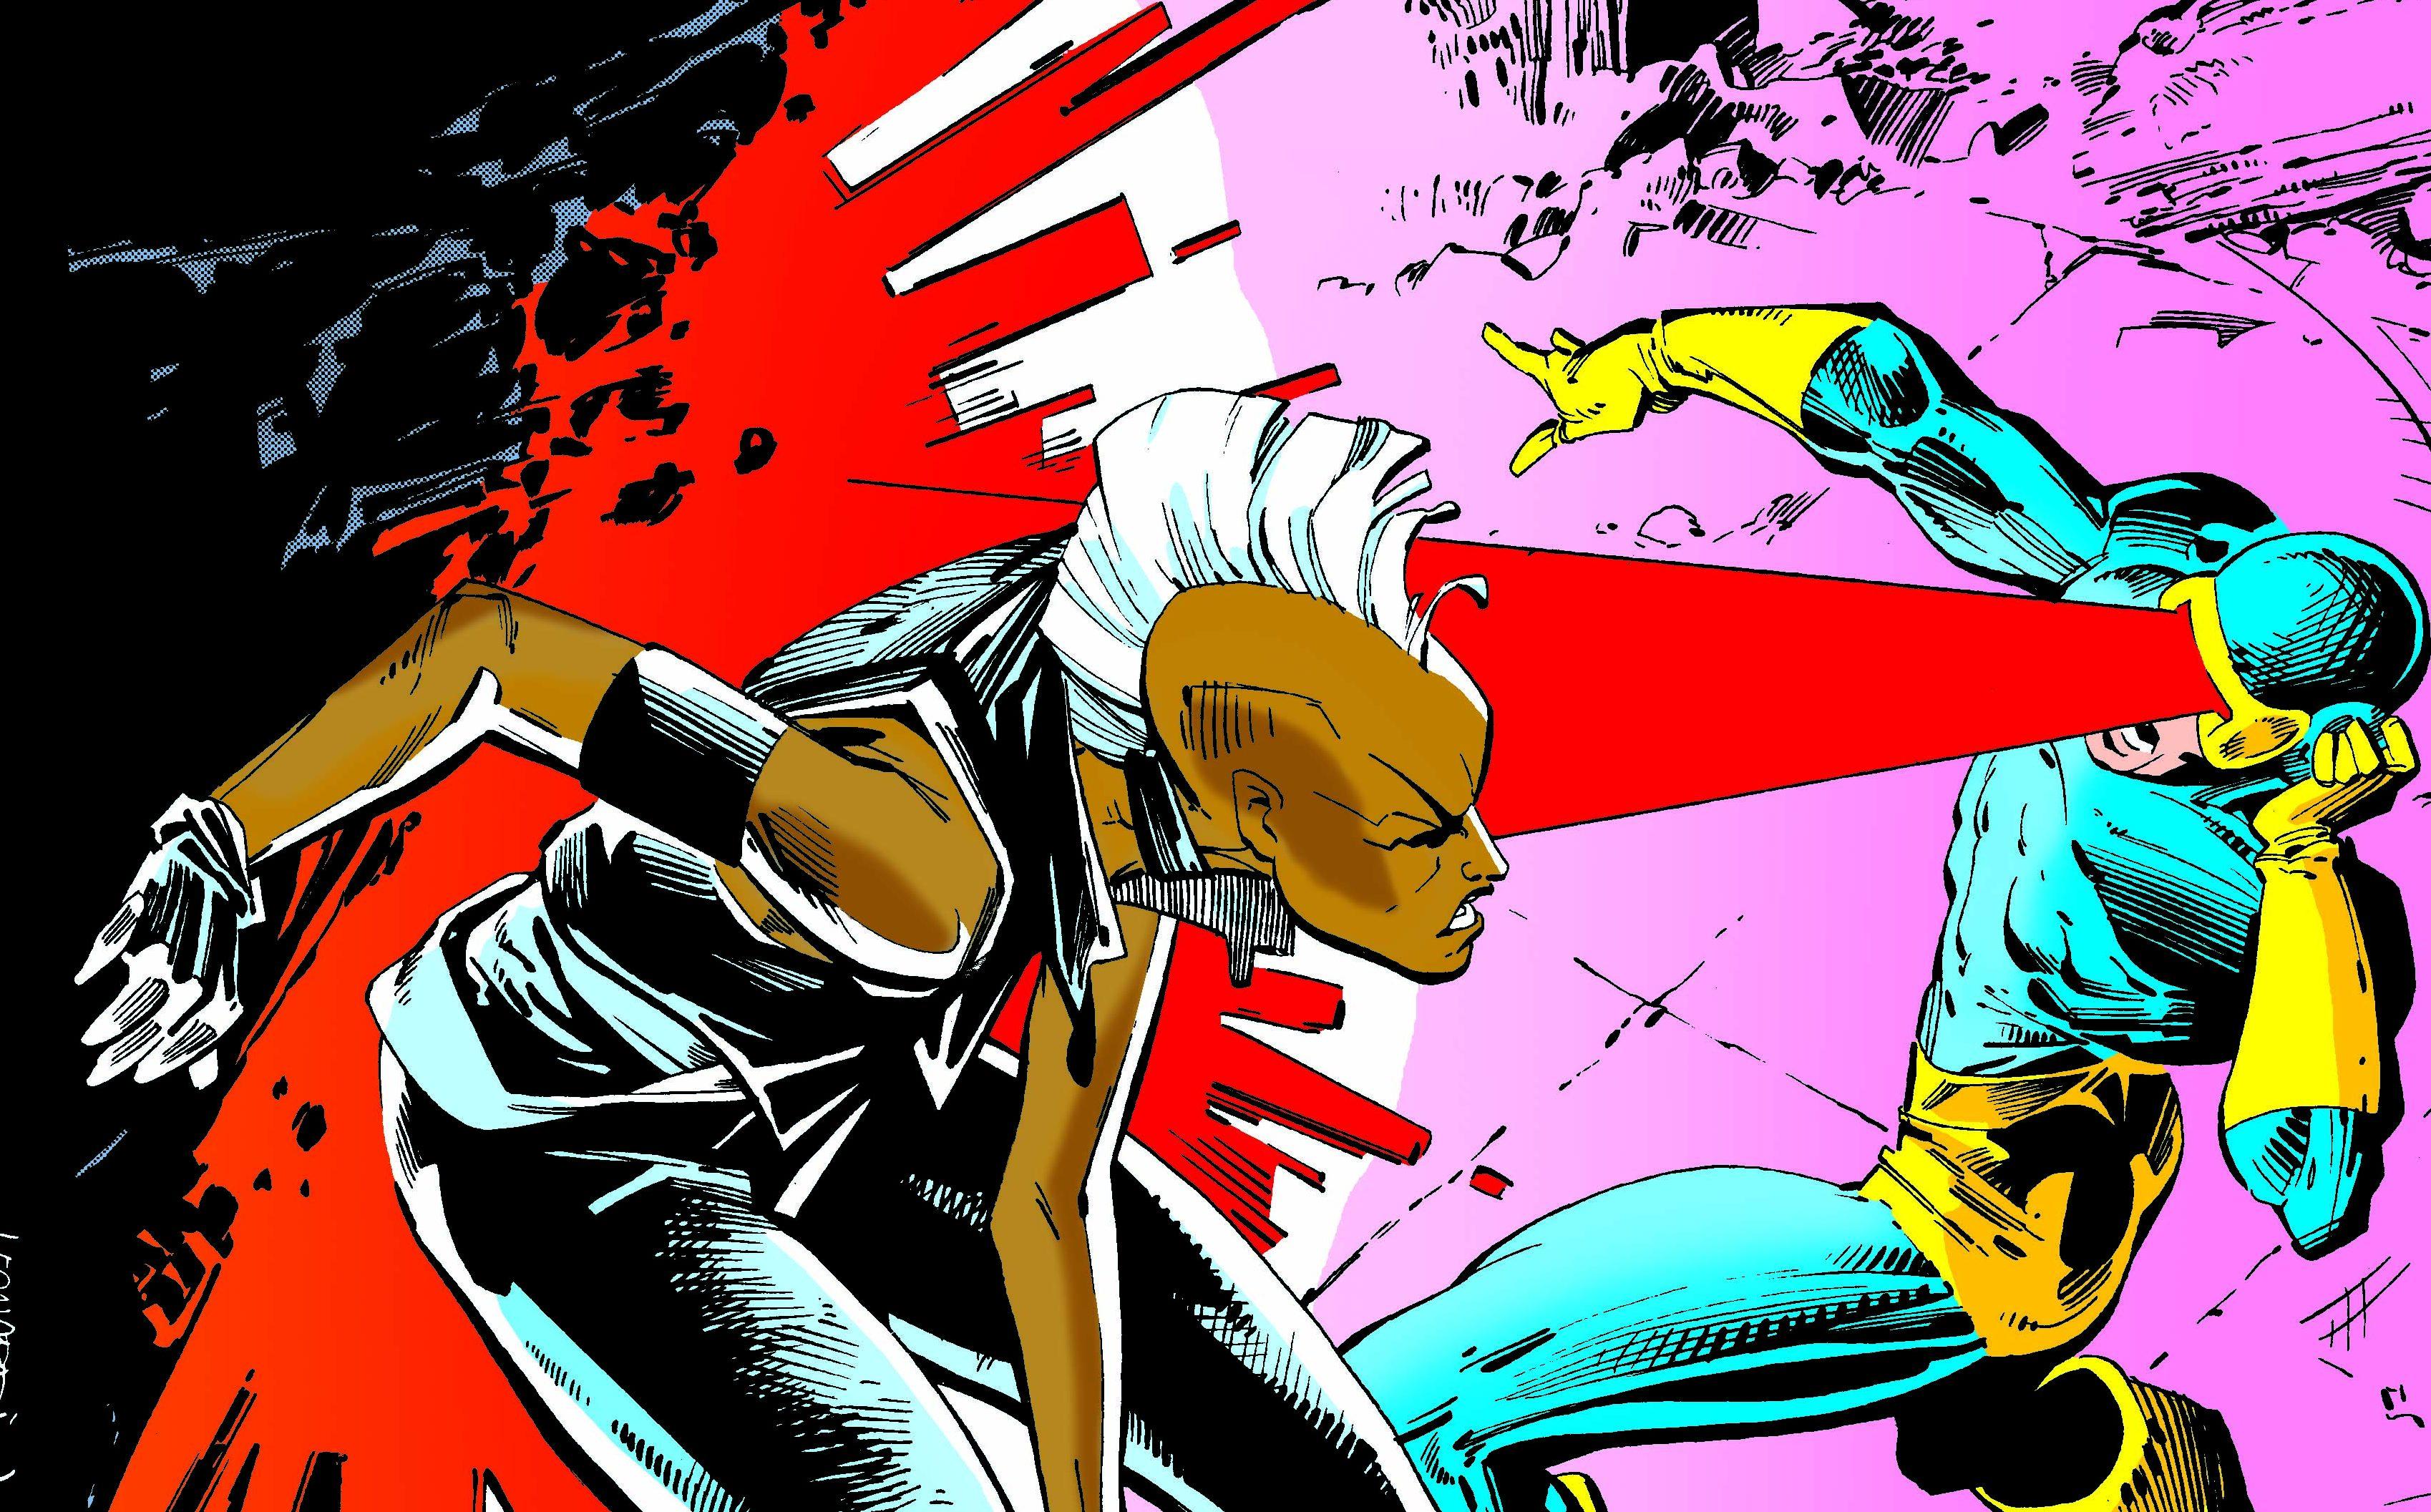 Storm is comics' overlooked groundbreaking superhero